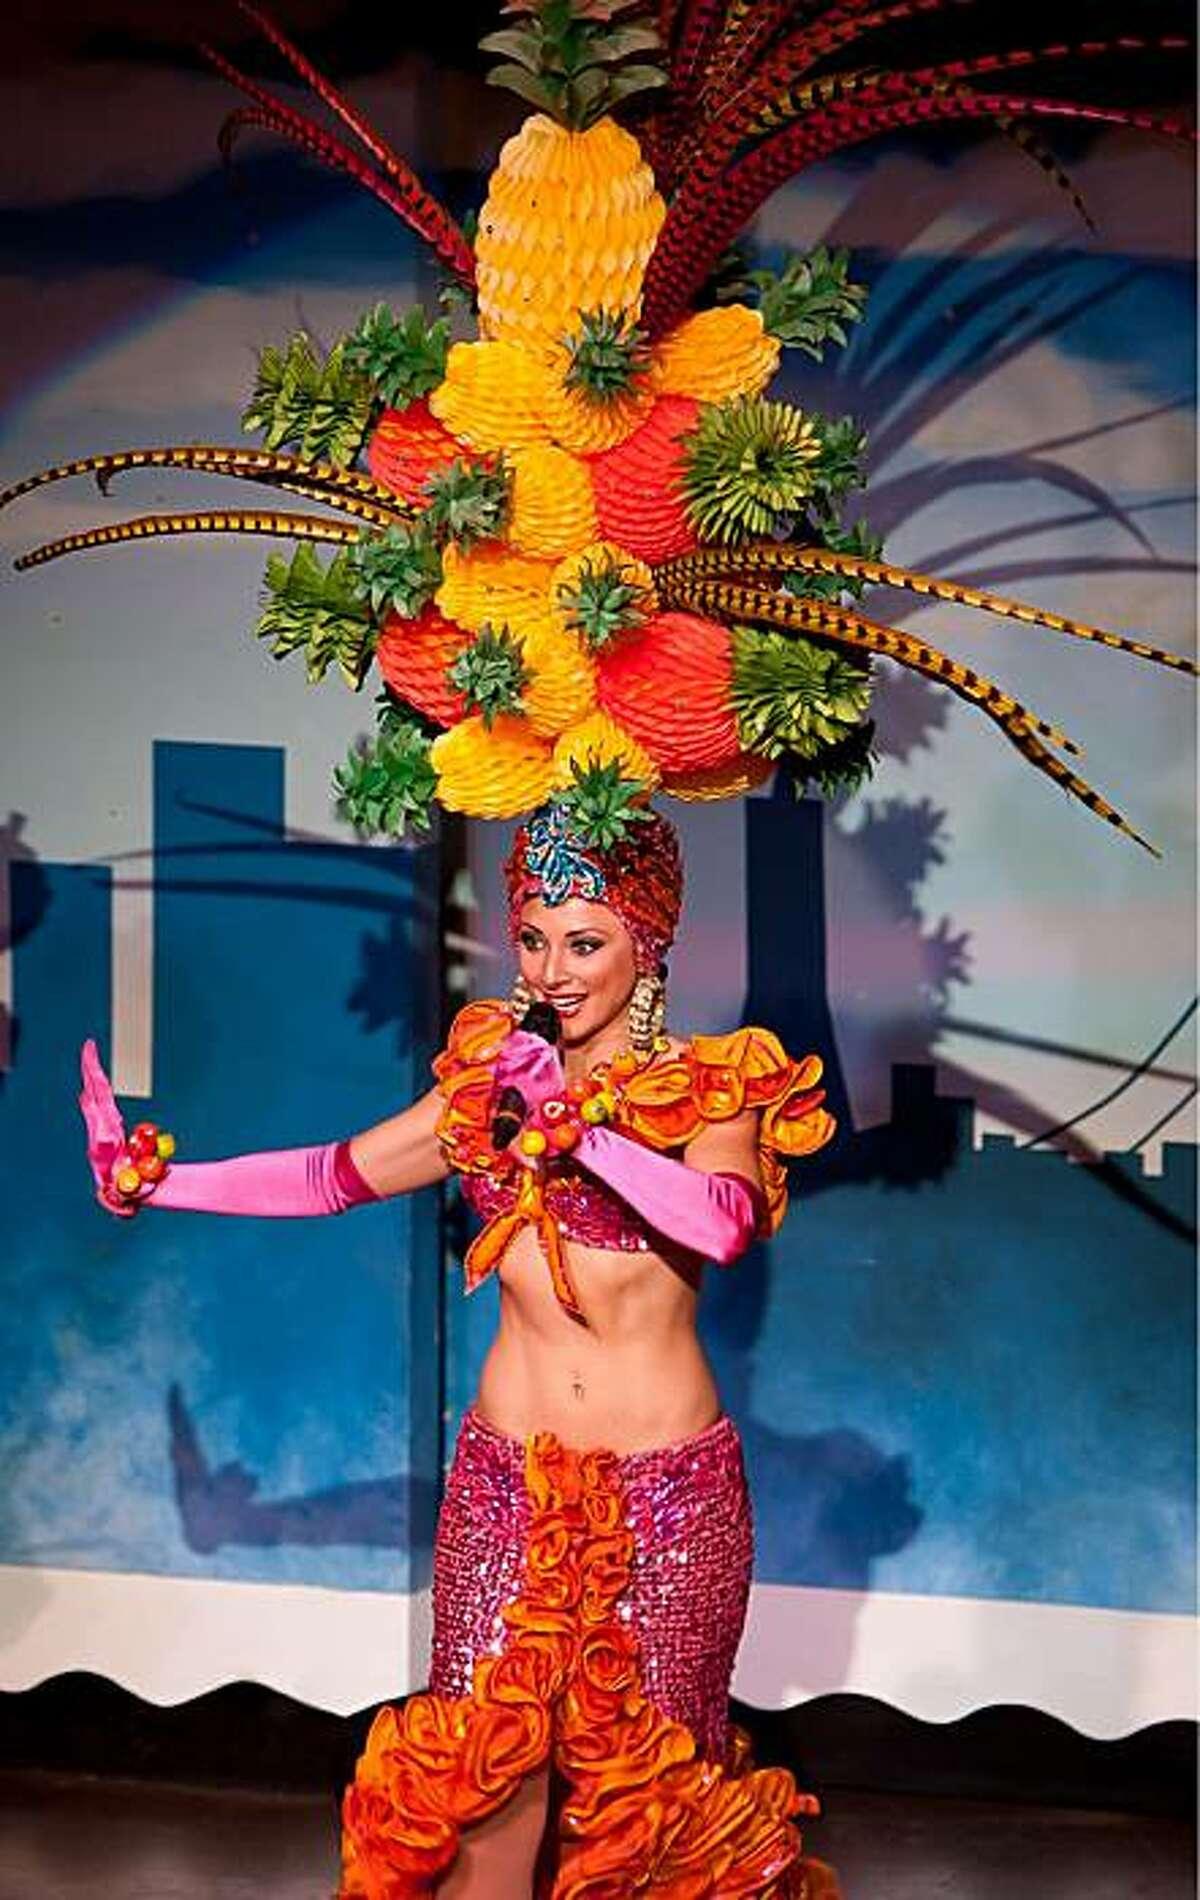 Jacqui Heck as the Pineapple Princess in Beach Blanket Babylon.